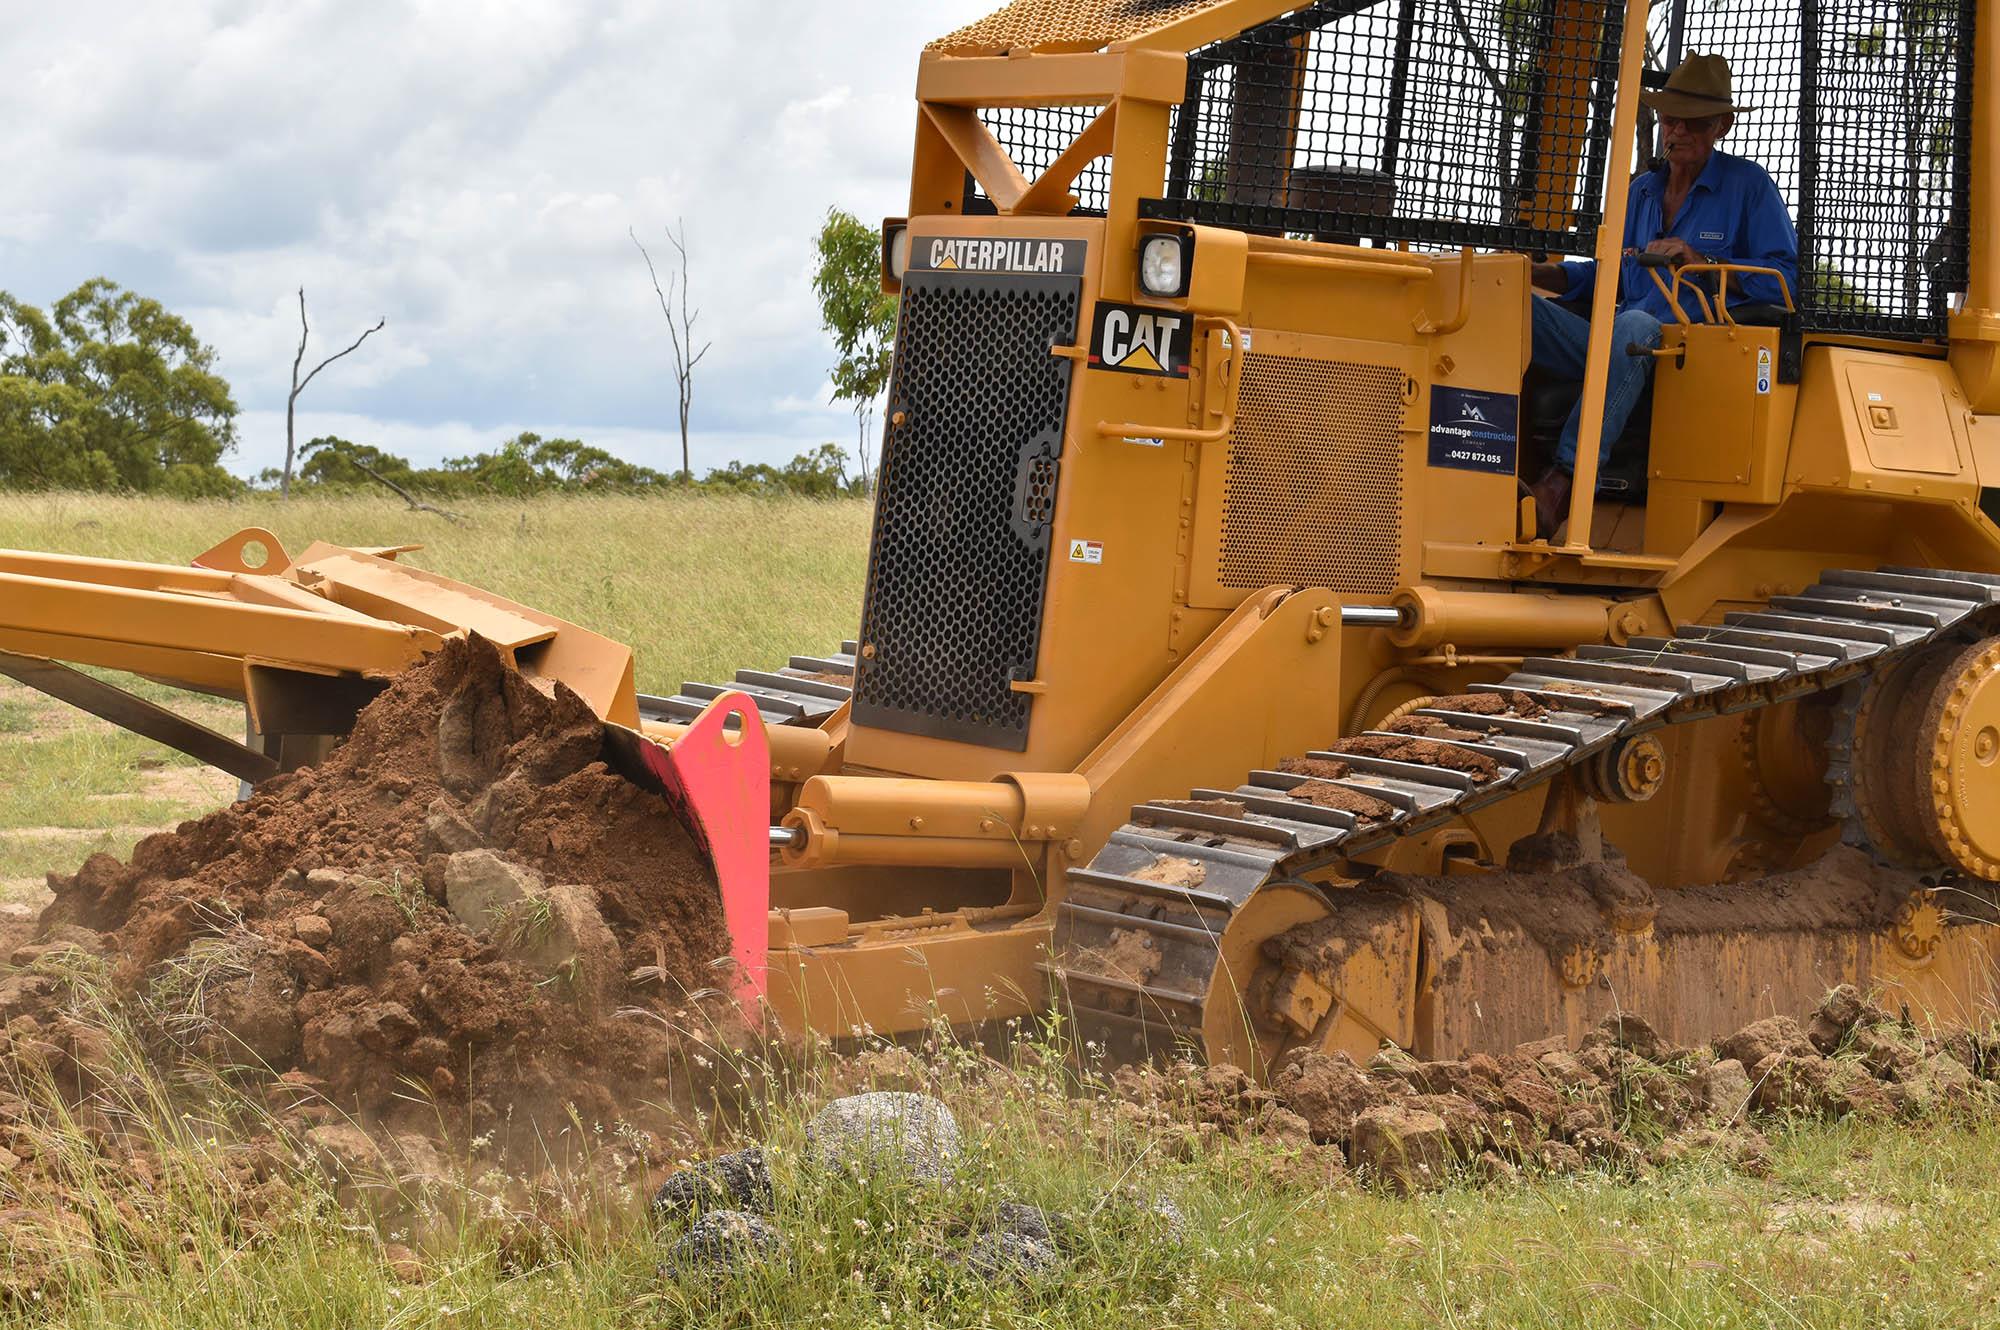 Constructing the erosion control bank (whoa boy)